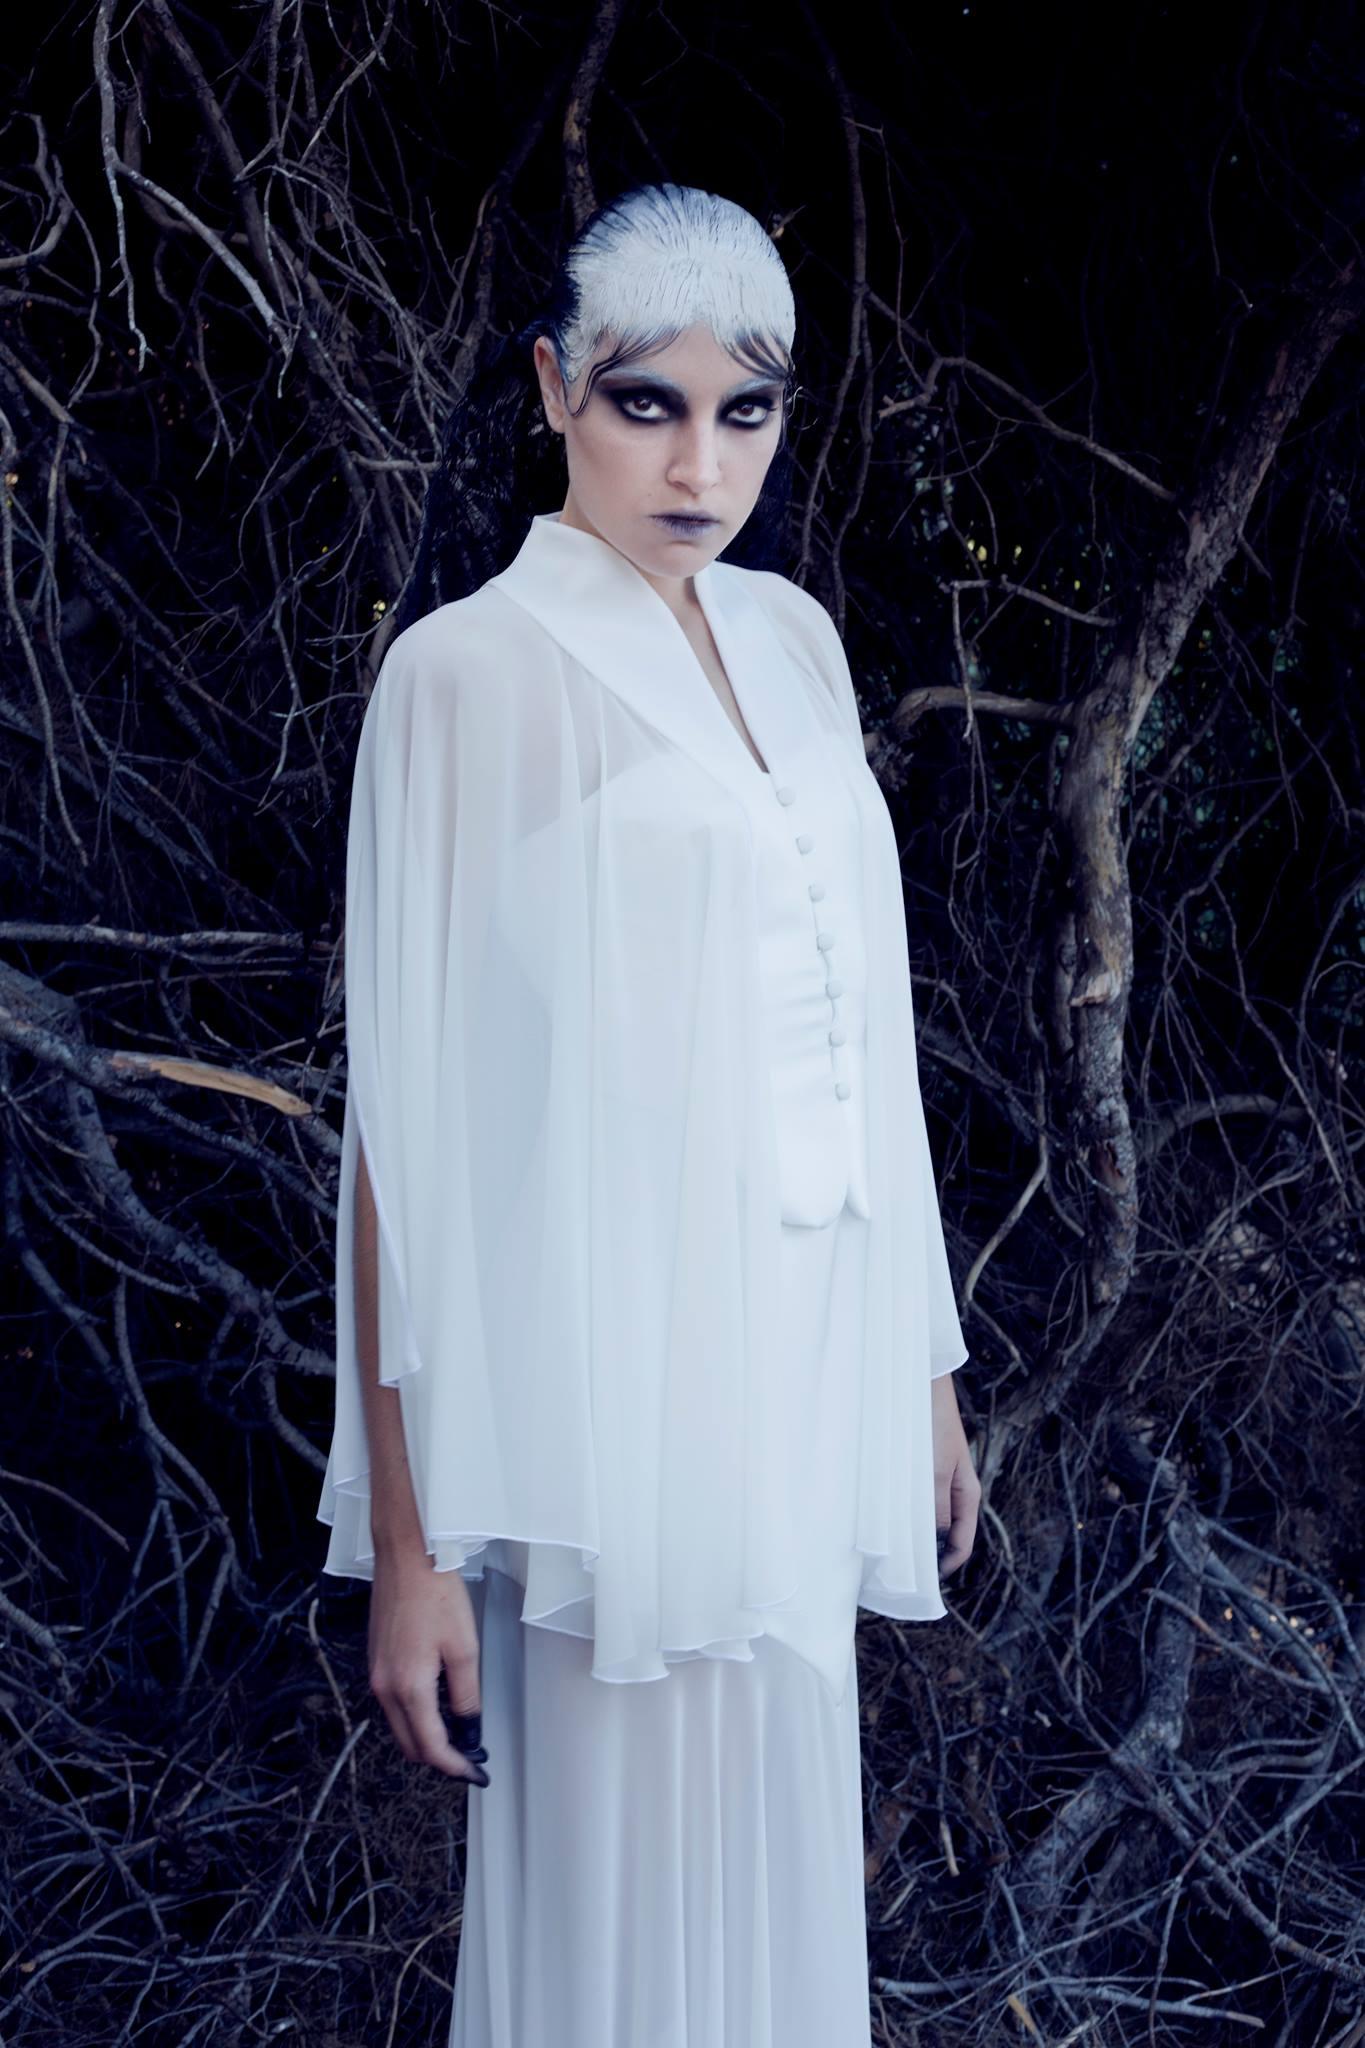 Angels  Fotógrafa: Clare Setian